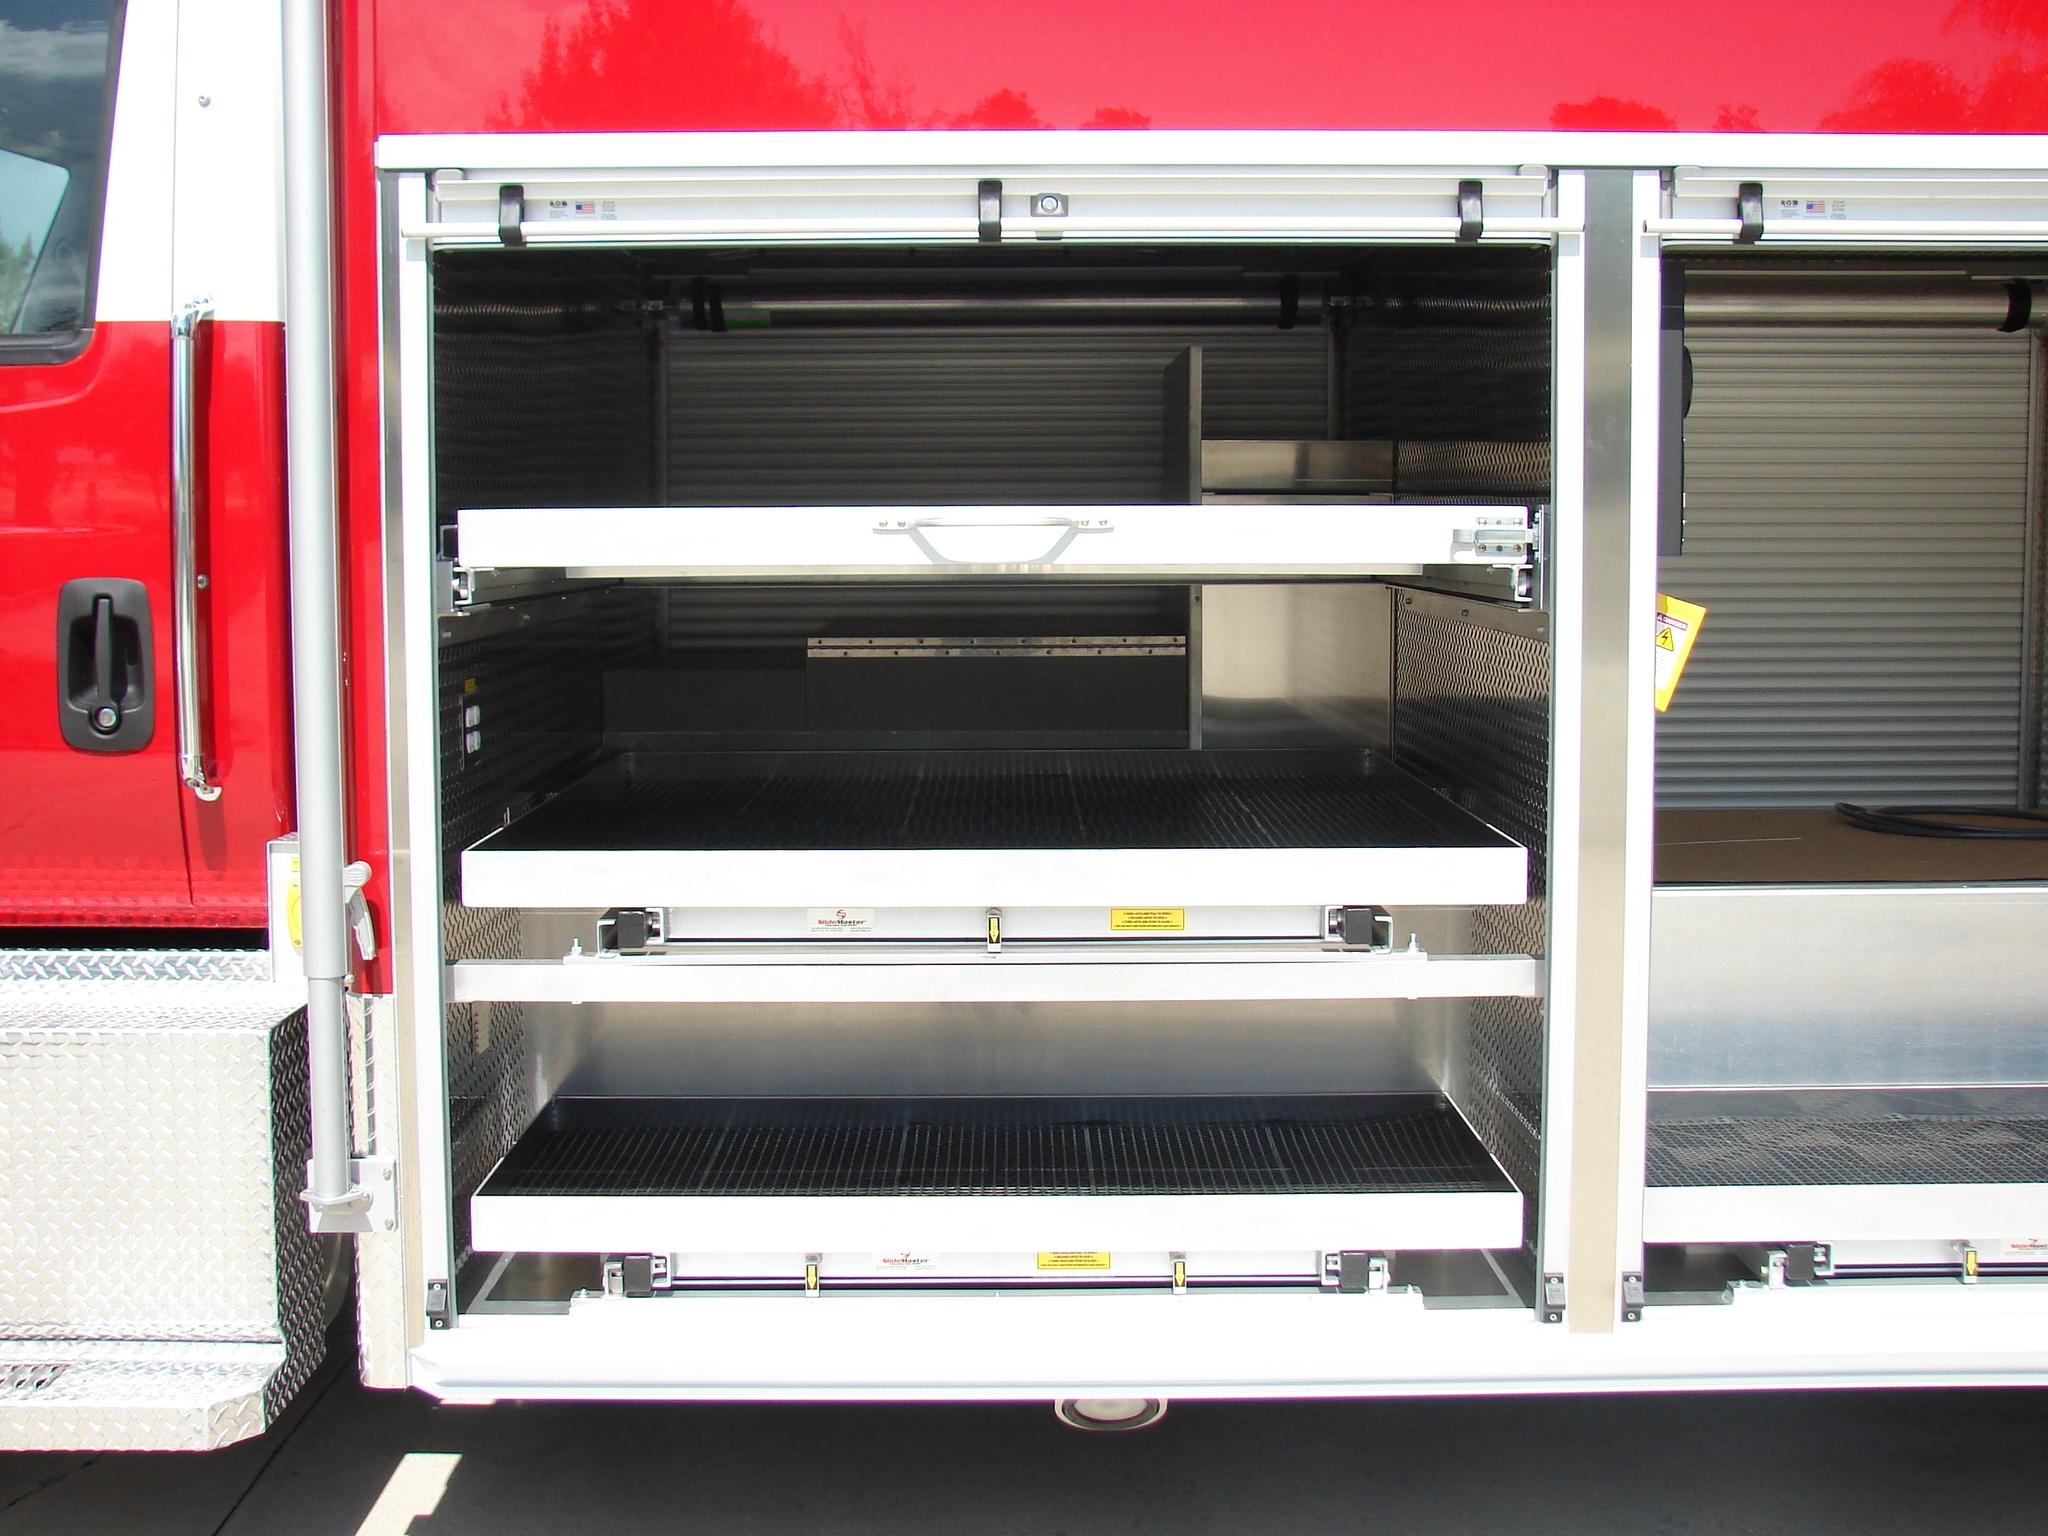 22-Ft. Non-Walk-In Air Cascade Unit